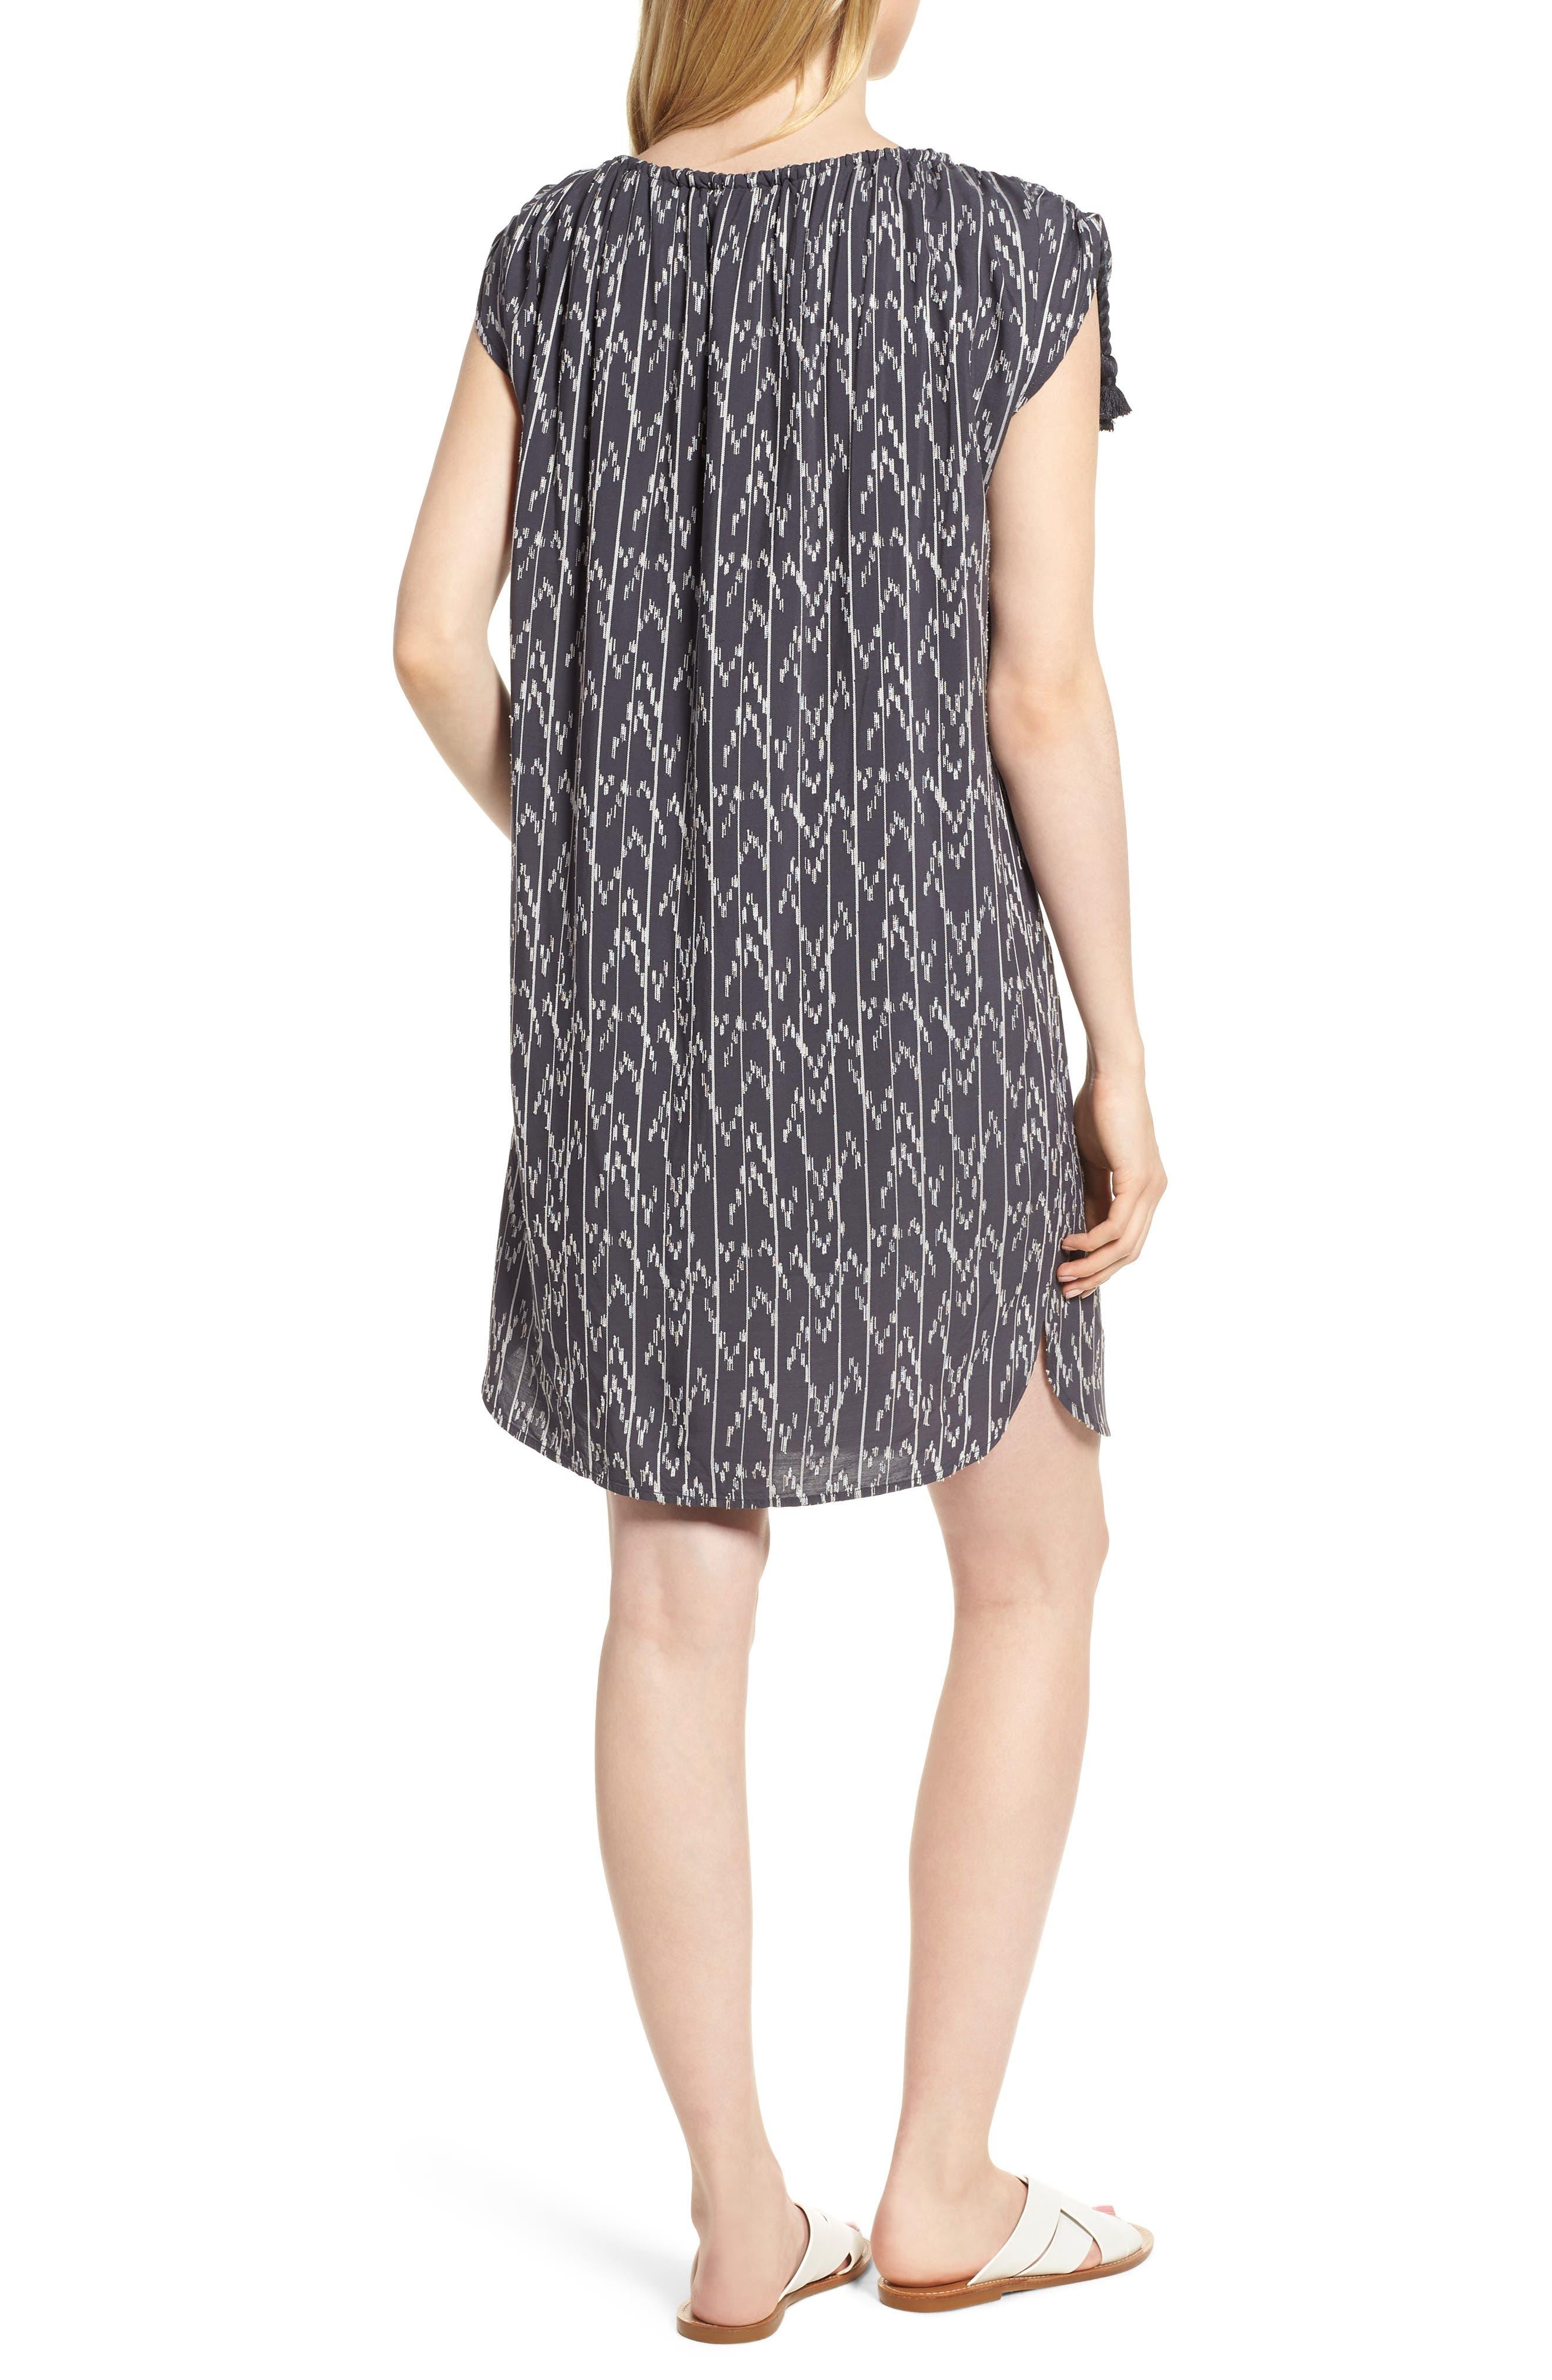 Market Embroidered Shirt Dress,                             Alternate thumbnail 2, color,                             Multi